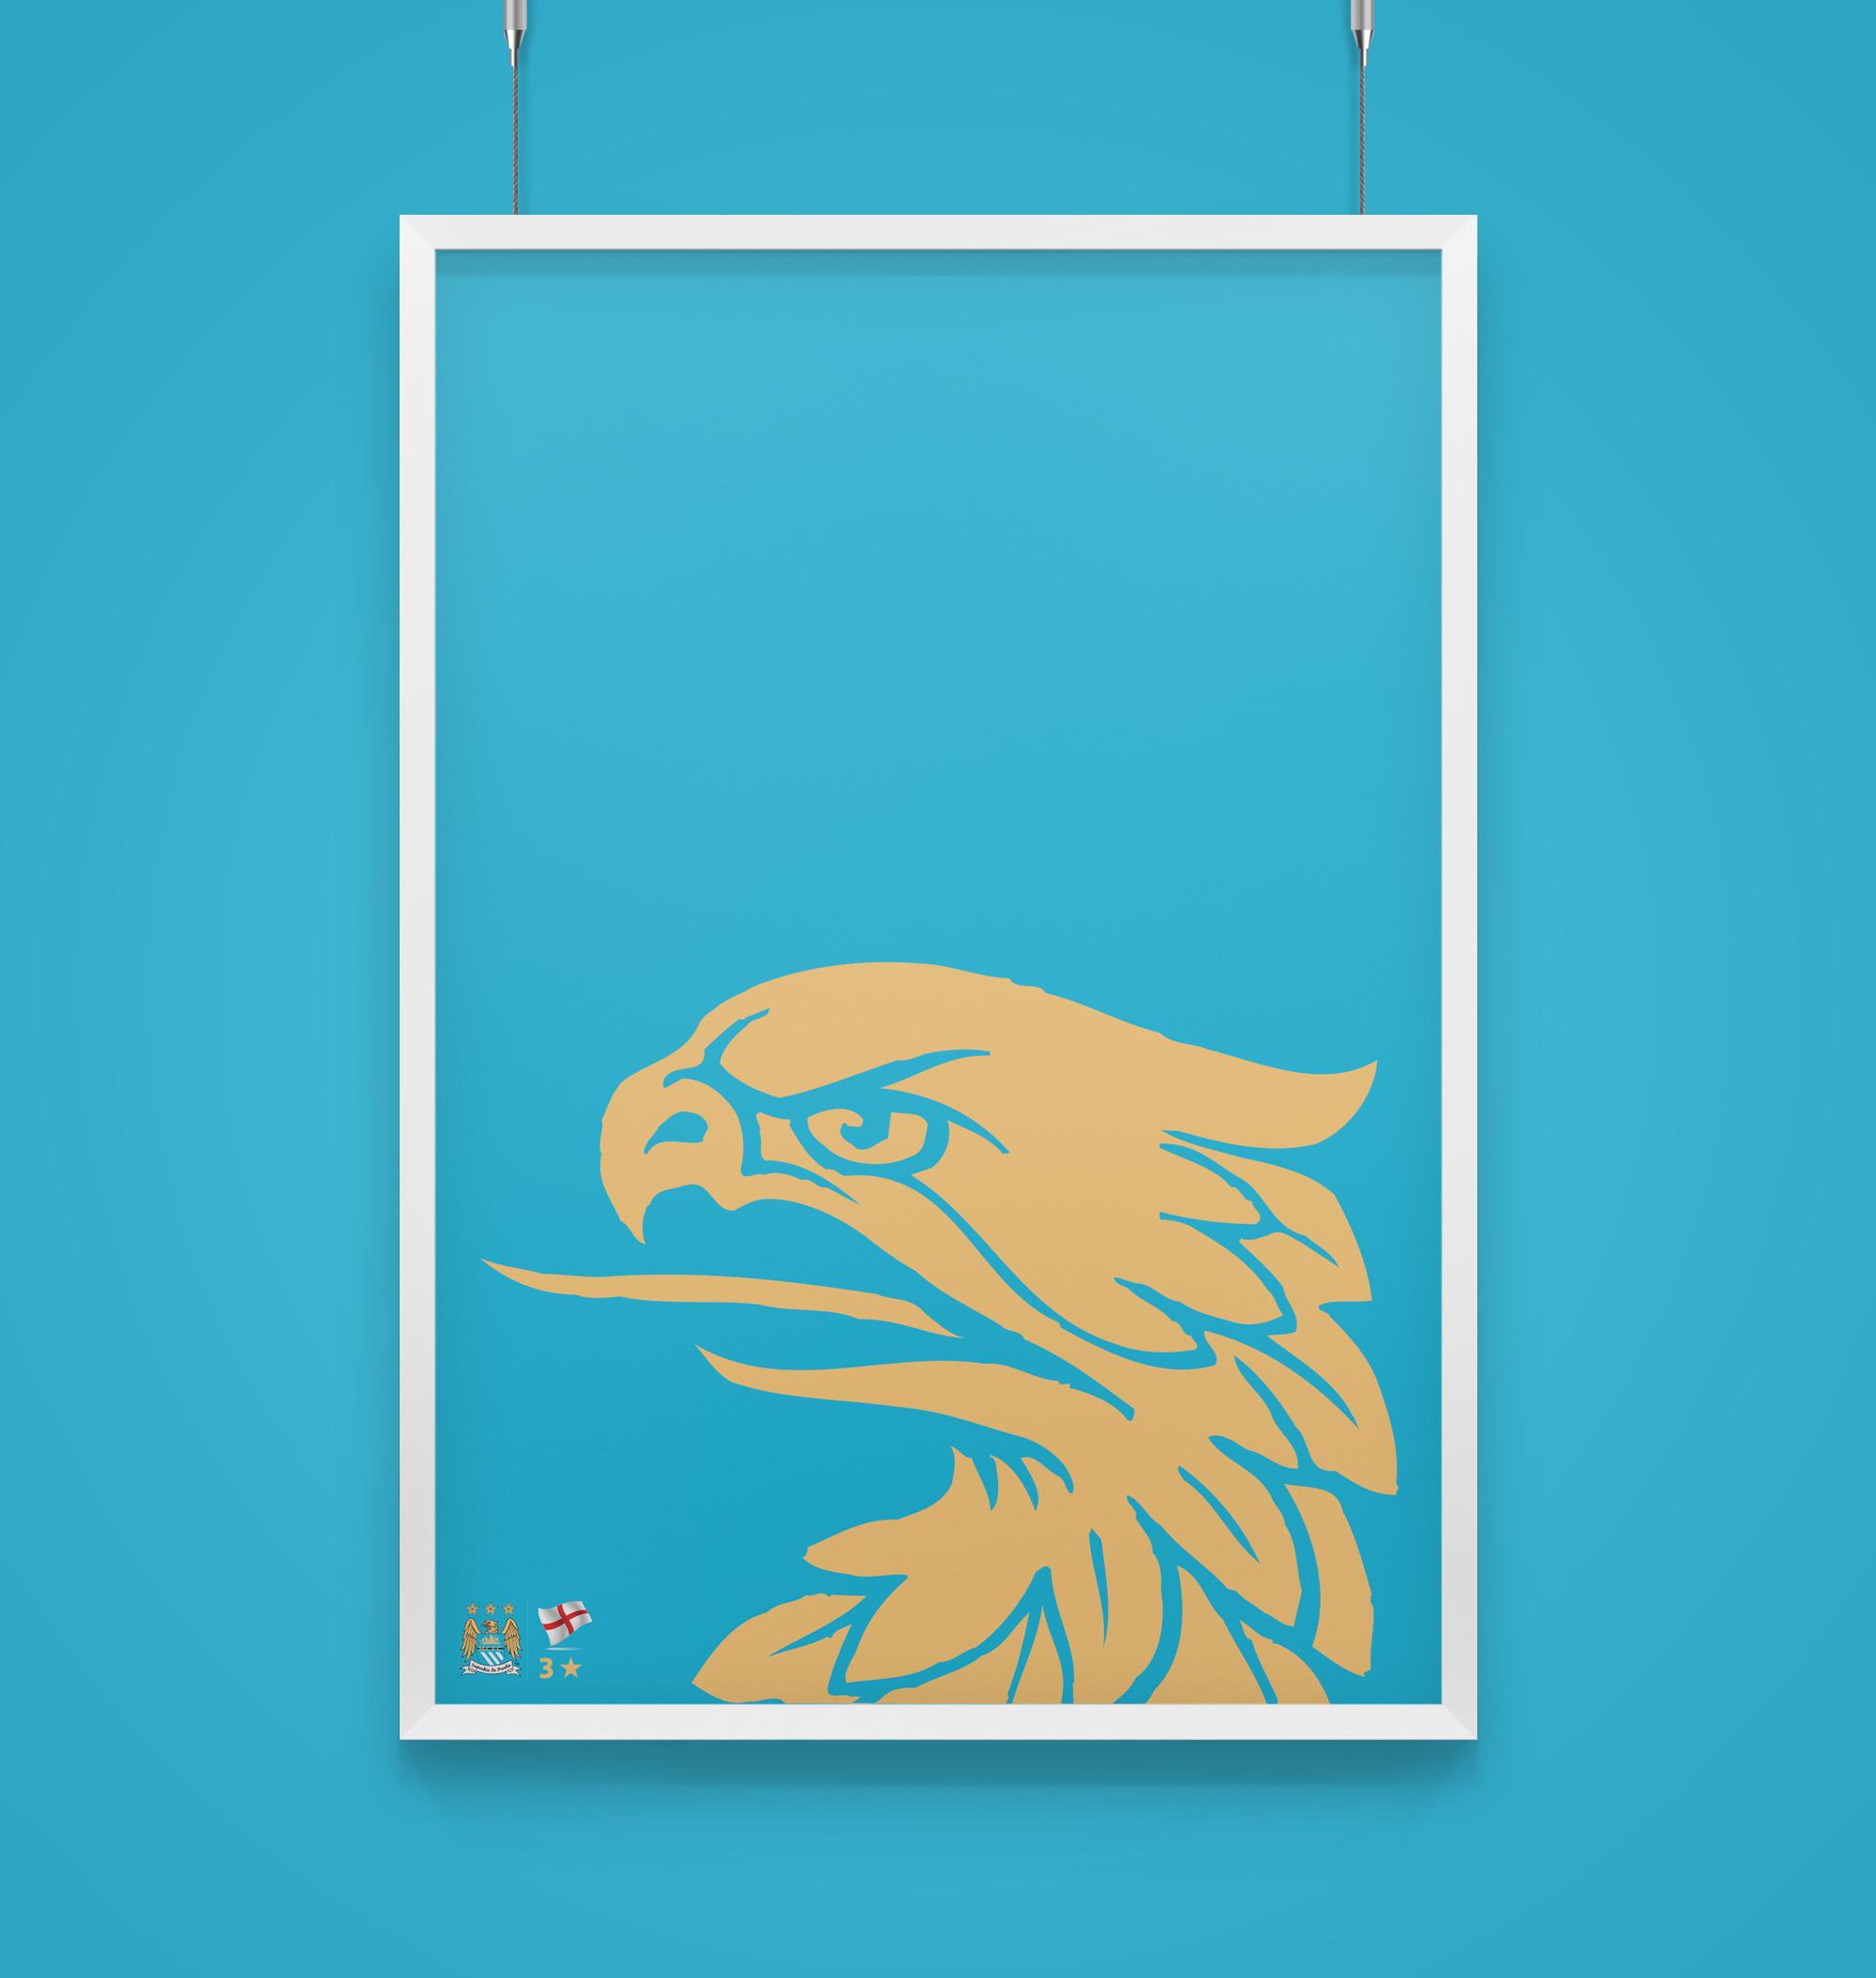 raniev-rod-alvarez-diseño-gráfico-queretaro-poster-minimalist-champions-5-manchester-city